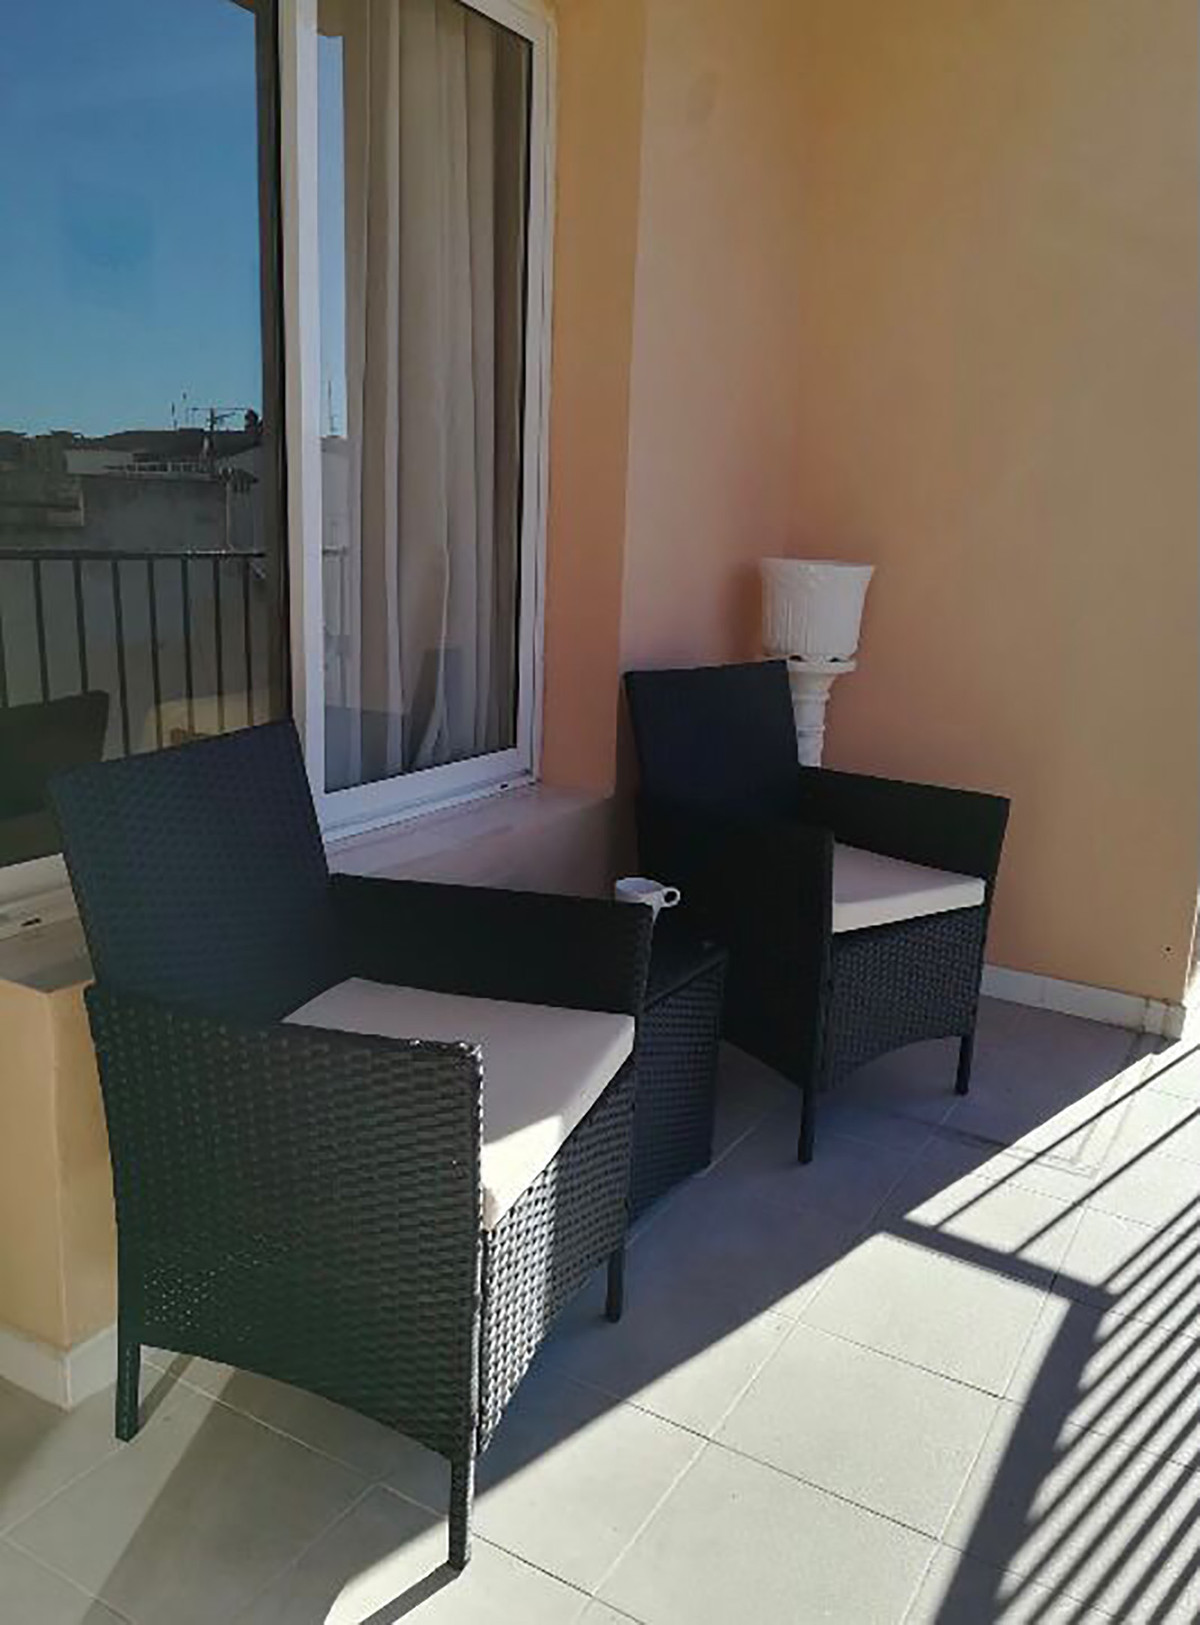 Middle Floor Apartment, Fuengirola, 50m from plaza de la constitucion Costa del Sol. 2.5 Bedrooms, 1,Spain